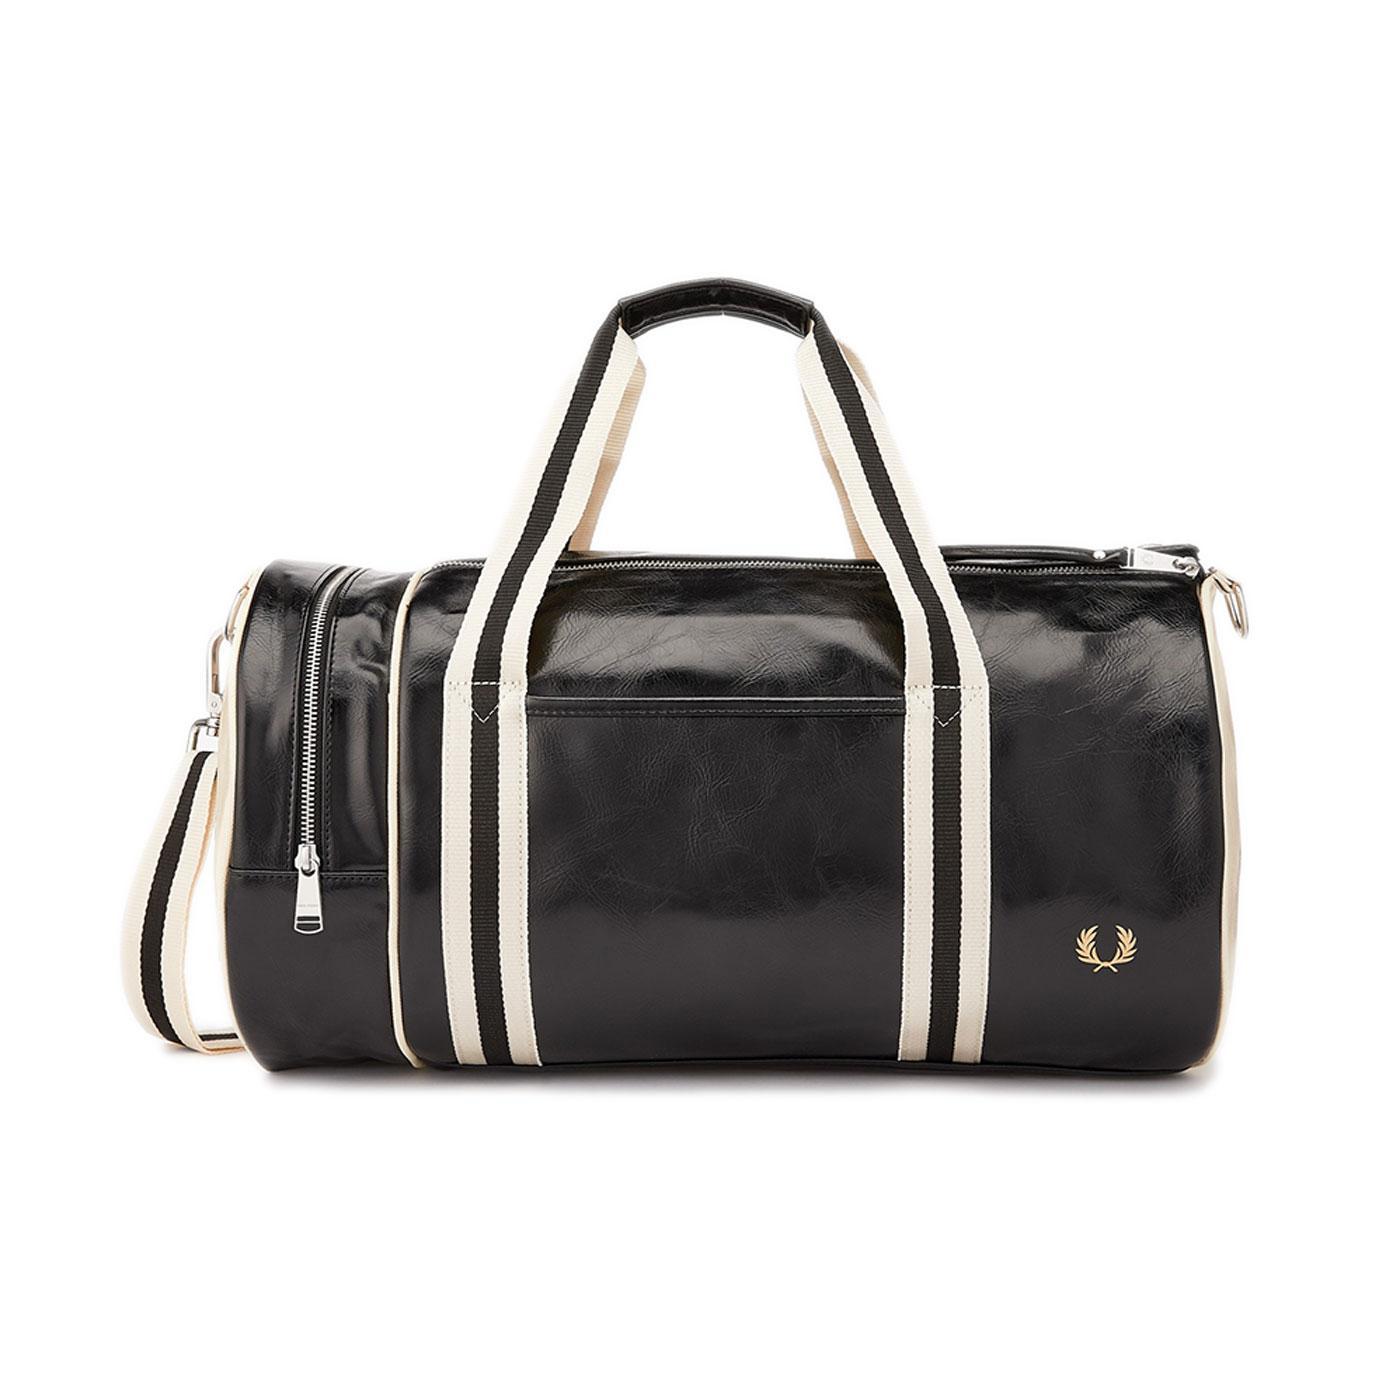 FRED PERRY Classic Retro Barrel Bag - Black/Ecru